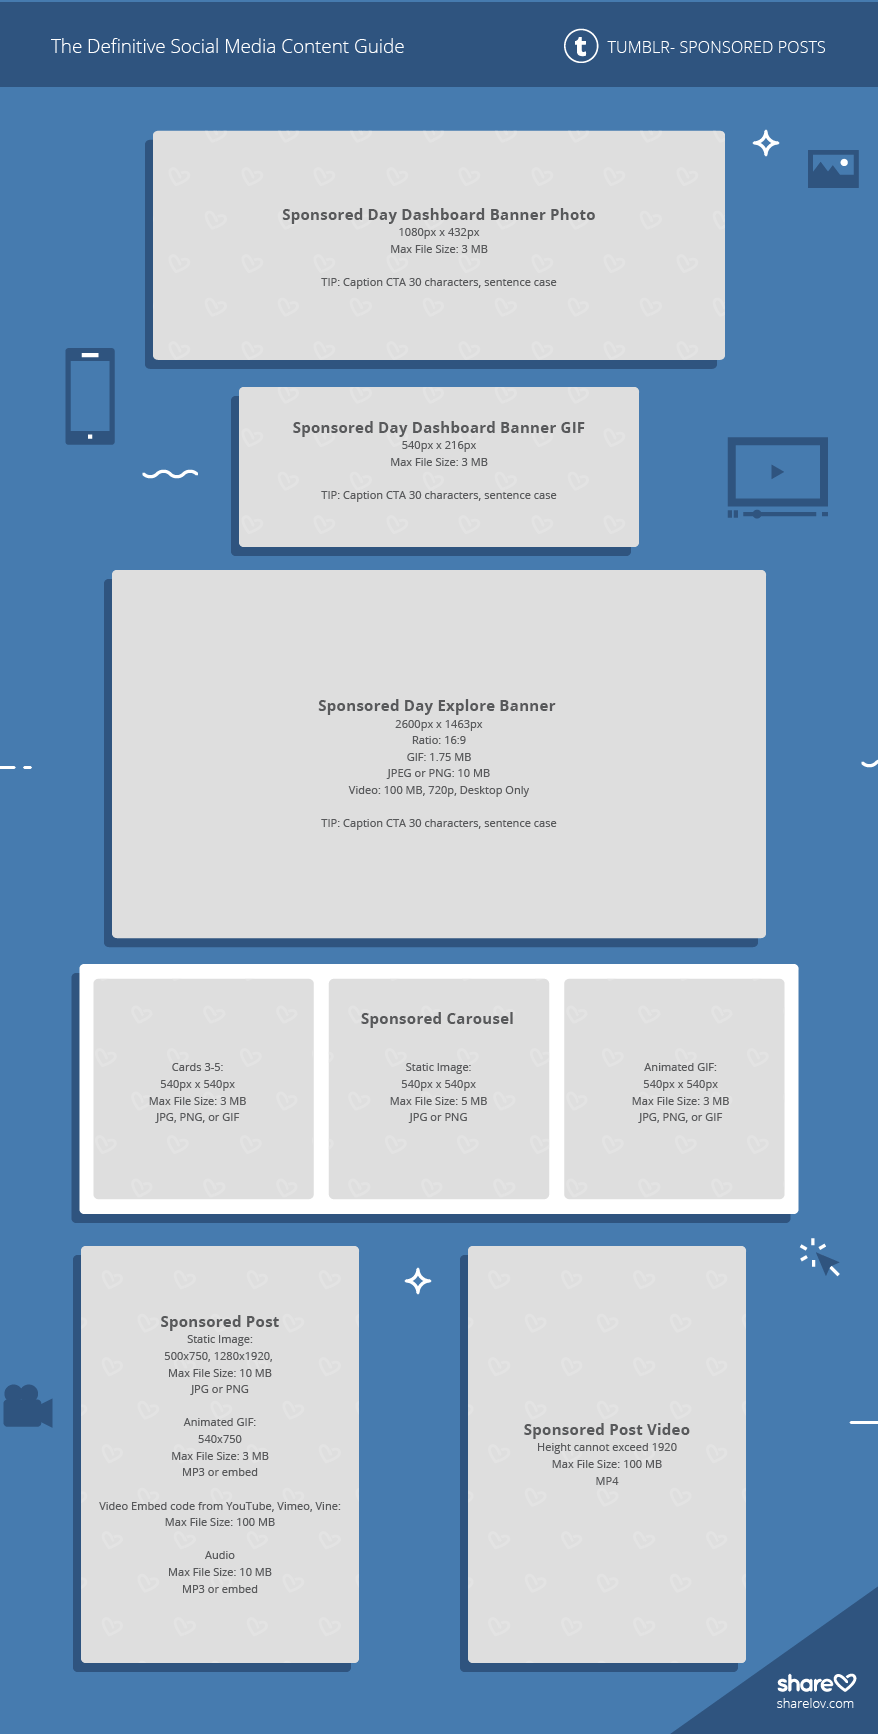 Tumblr Sponsored Posts image sizes